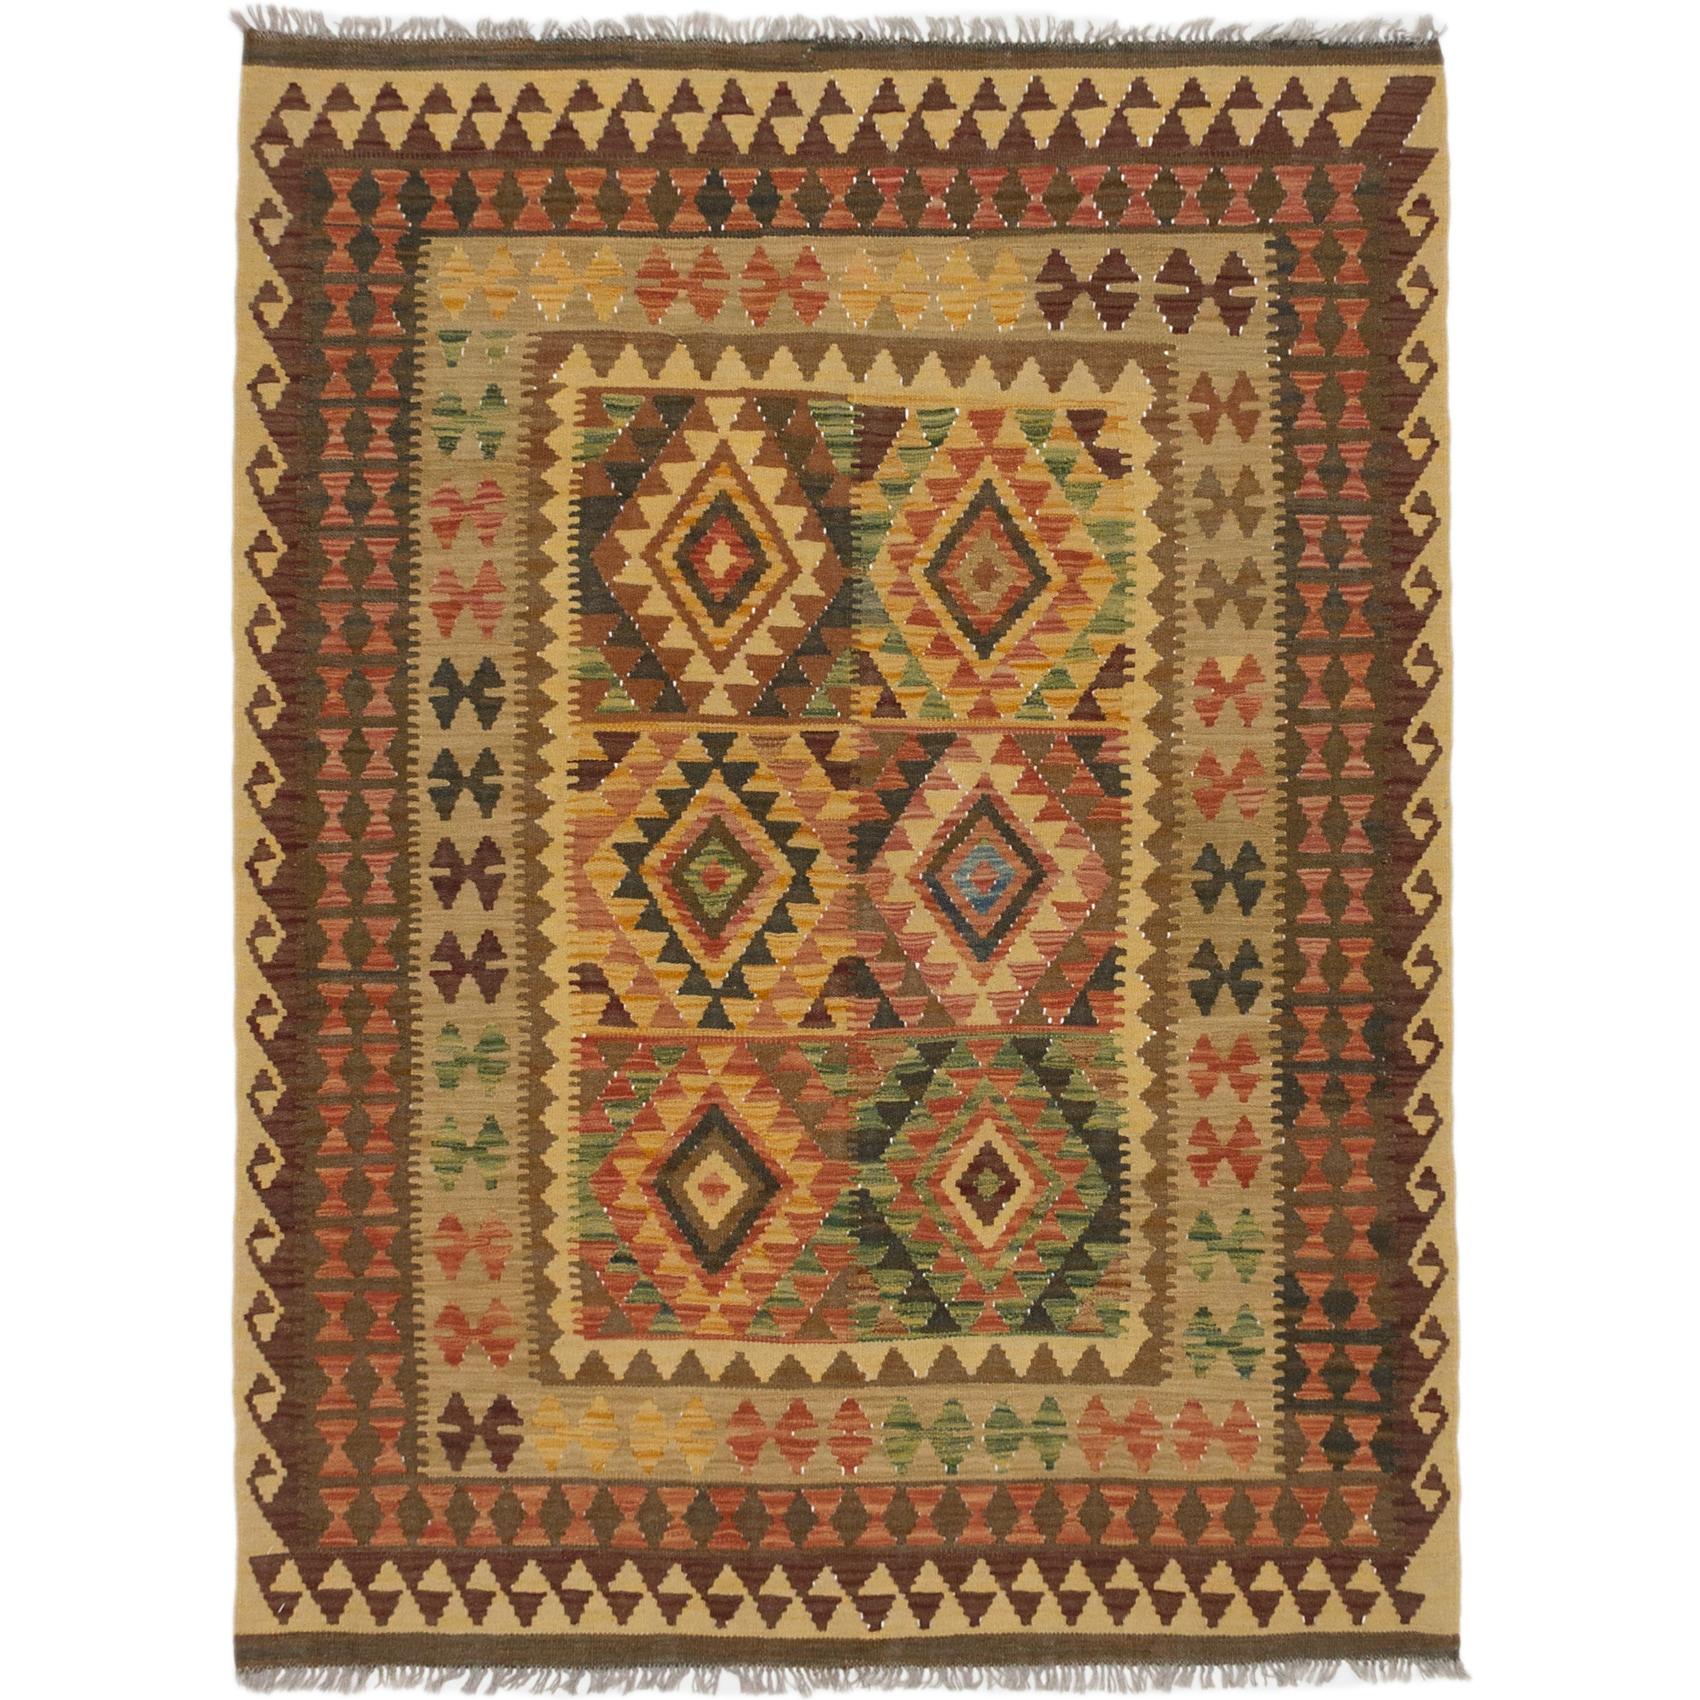 Flat Weave Anatolian Copper Gold Wool Kilim On Sale Overstock 17040125